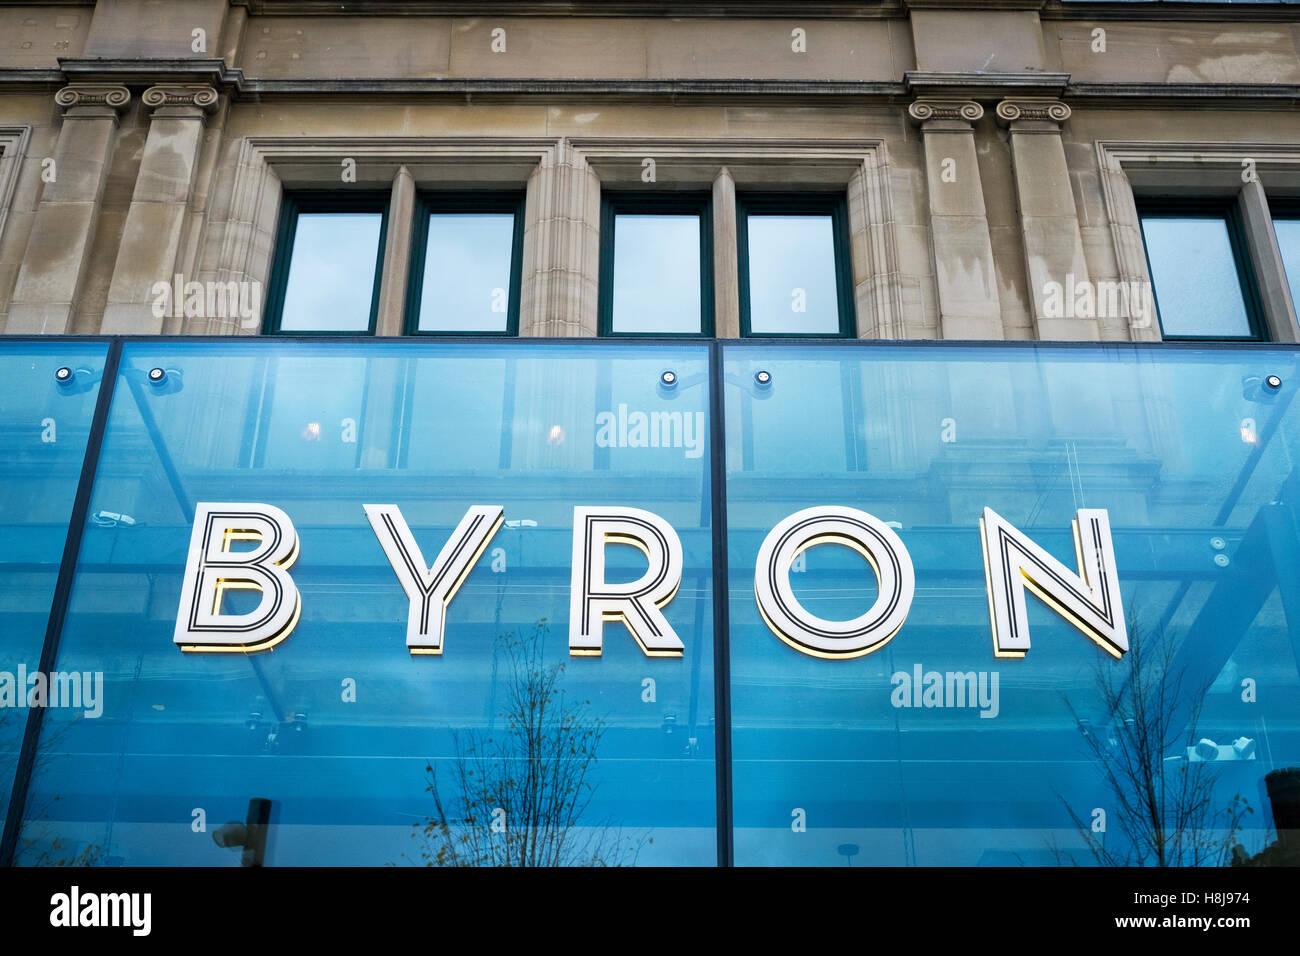 'Byron' burger restaurant in Manchester city centre, UK. - Stock Image